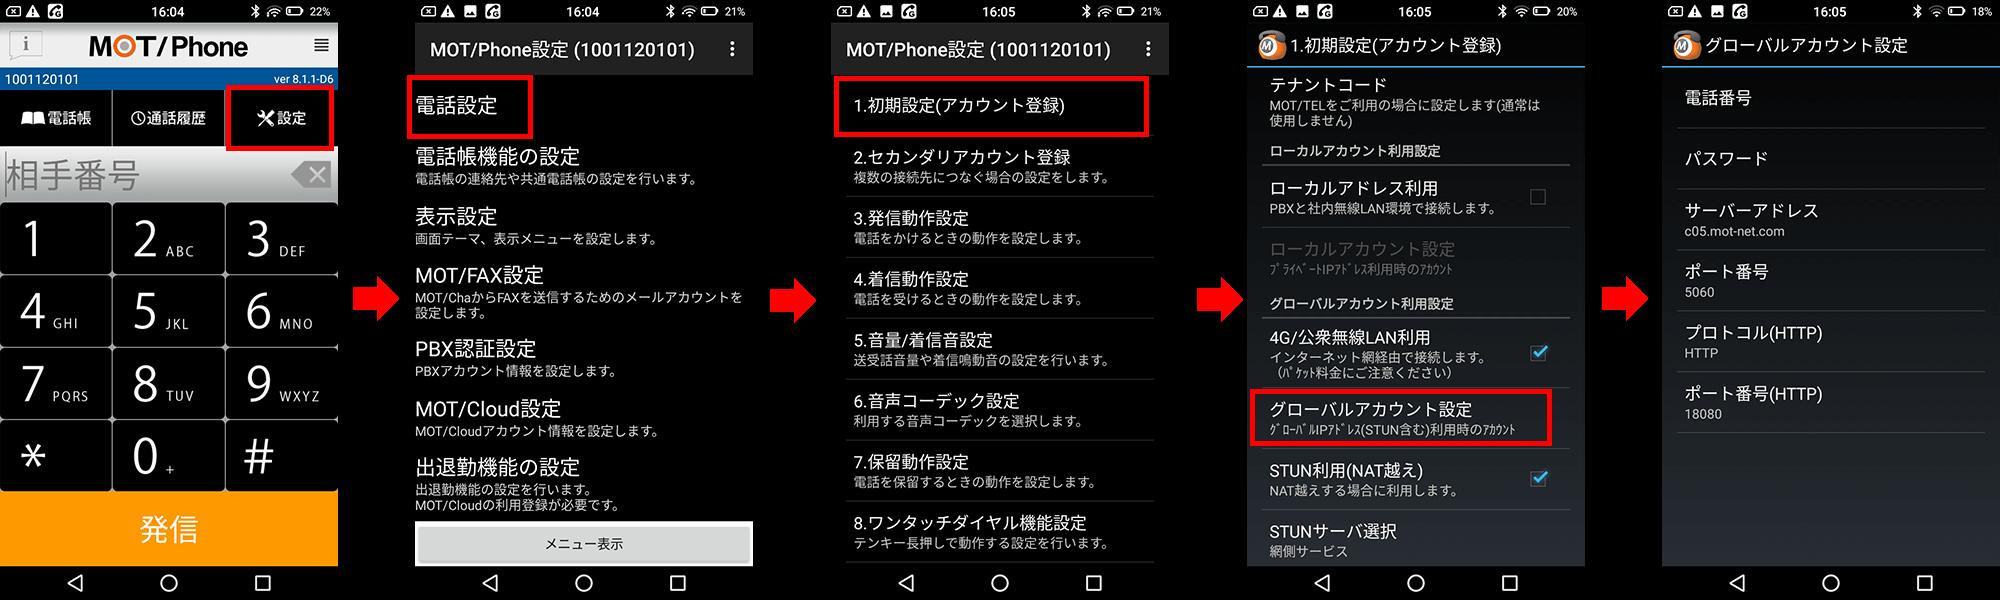 MOT/Phone android設定画面